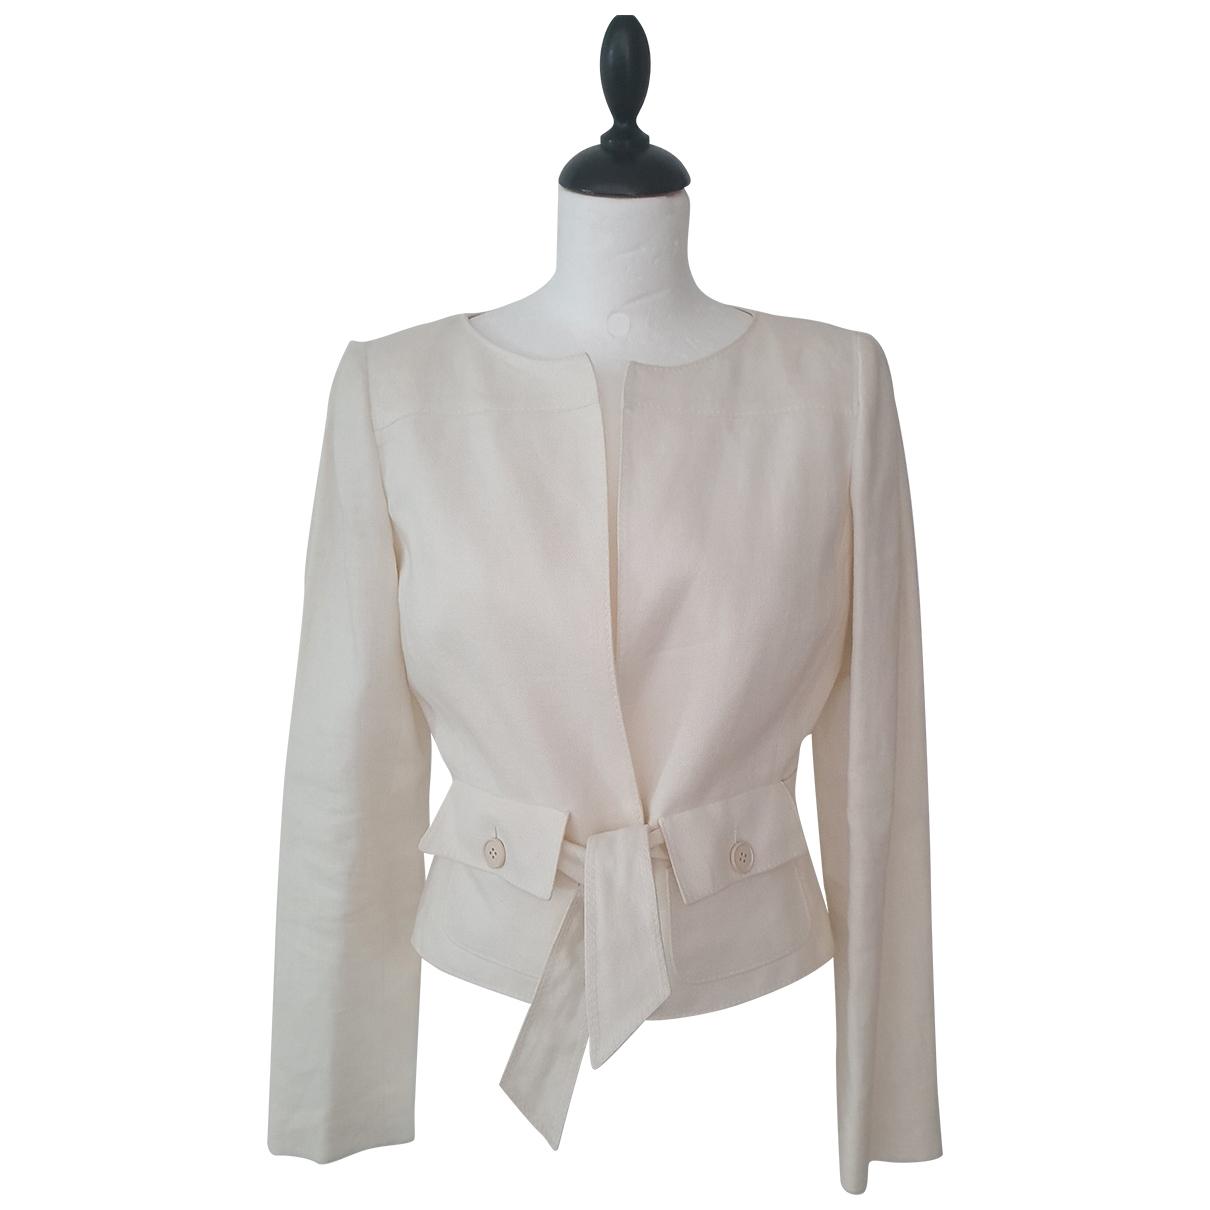 Valentino Garavani \N Linen jacket for Women 8 UK